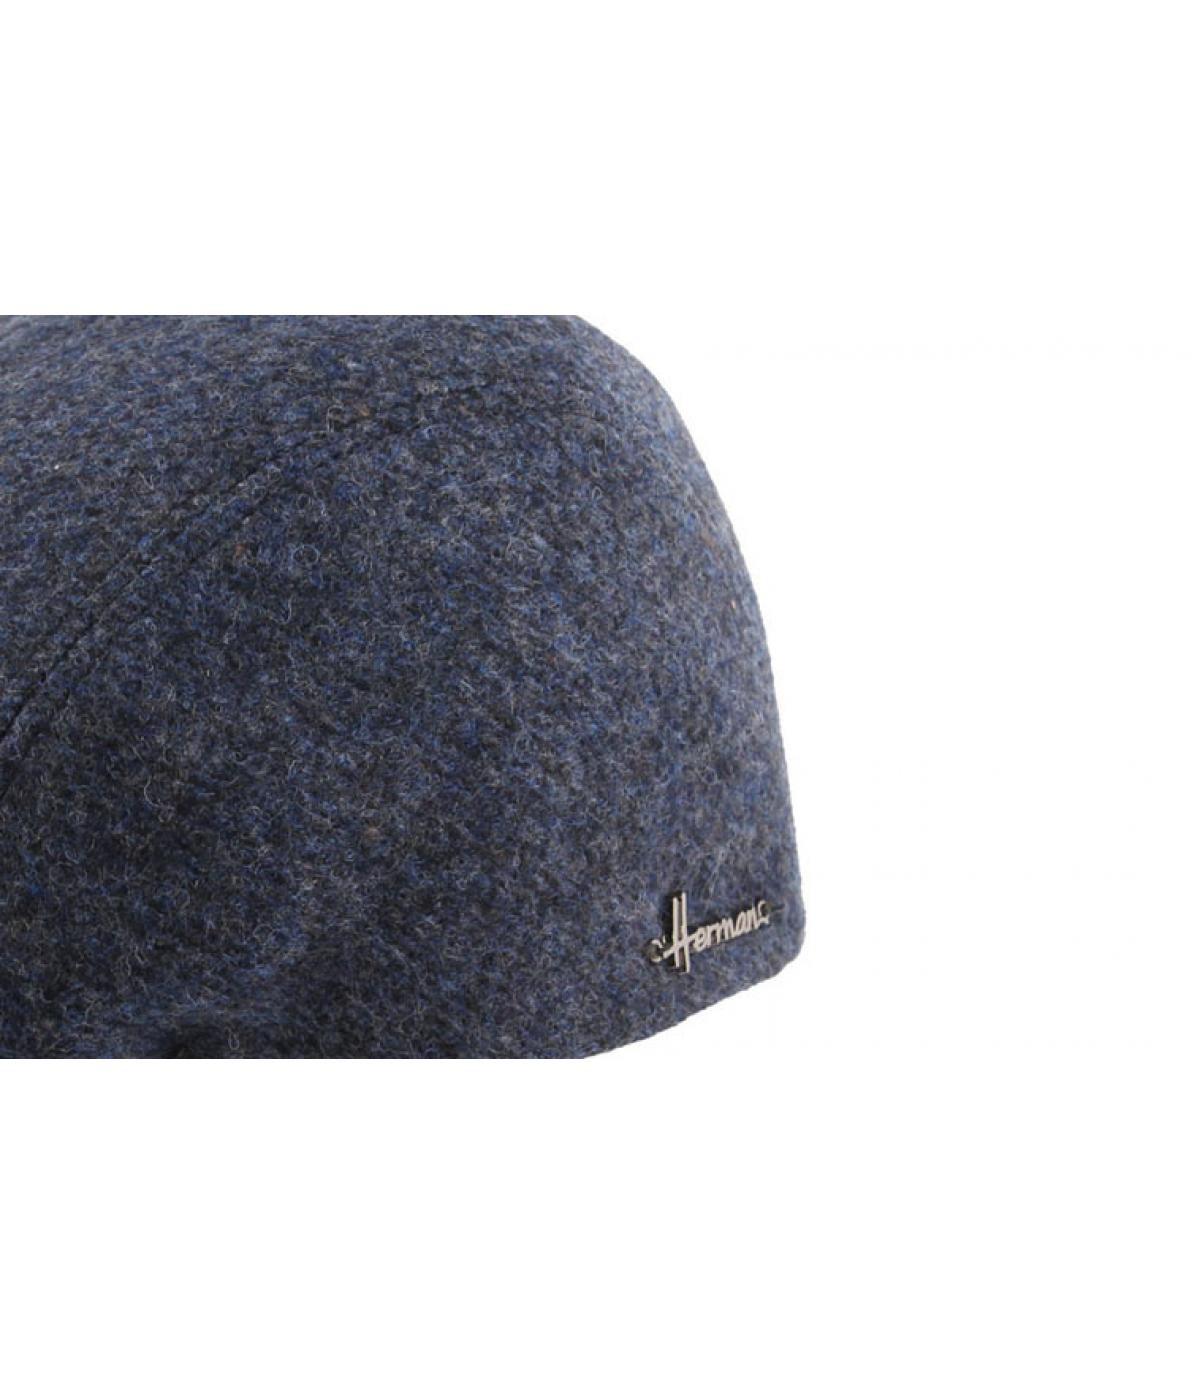 Détails Hill wool EF blue - image 3